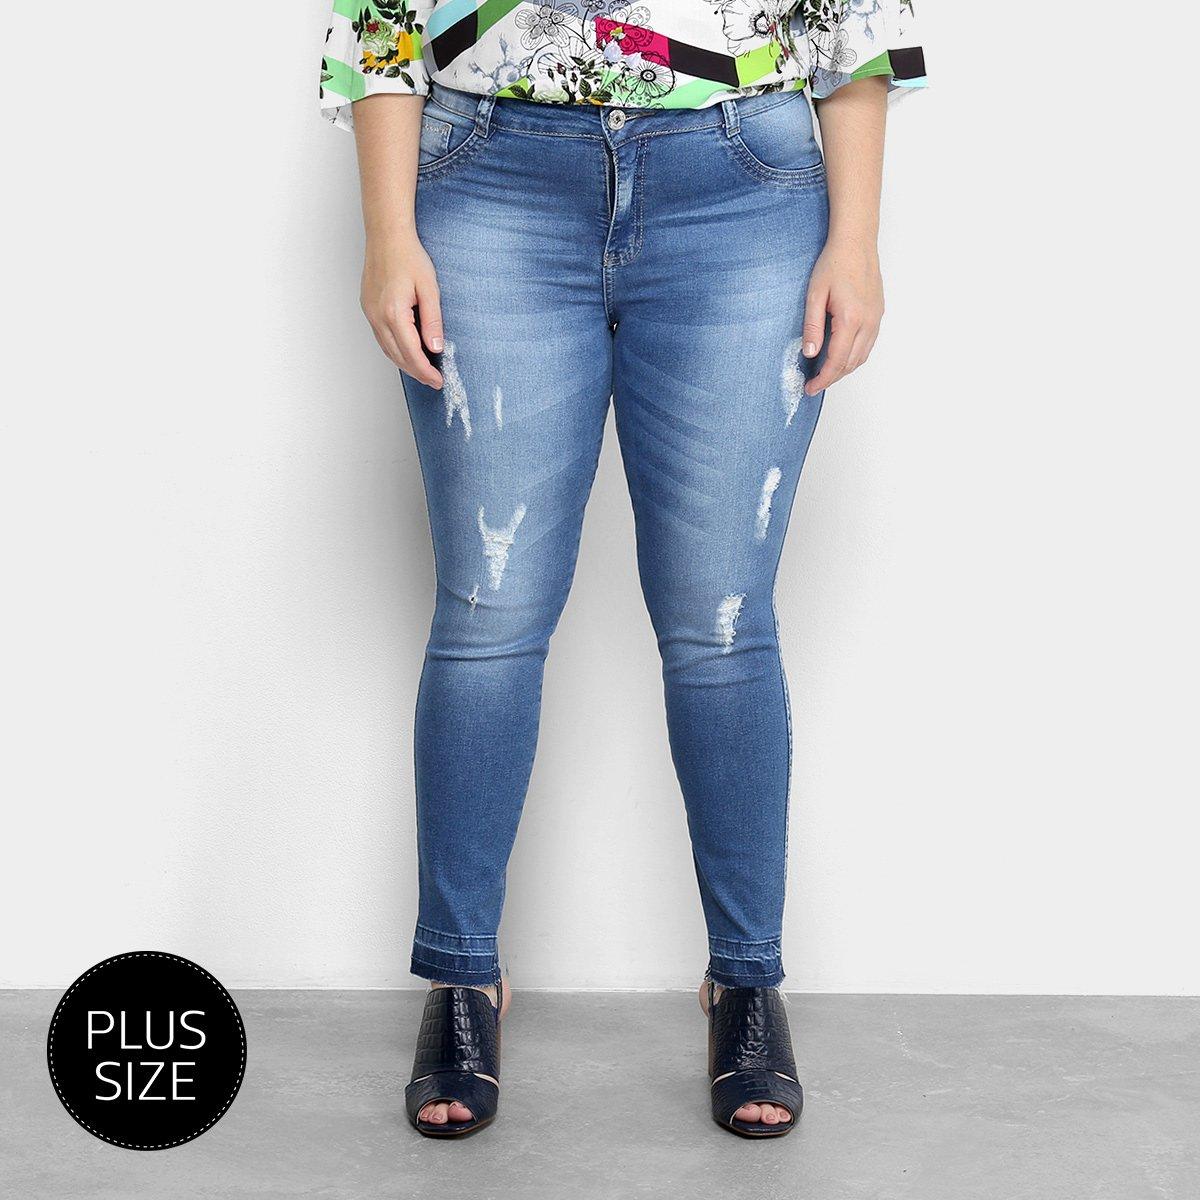 2bcc8959f Calça Jeans Skinny Biotipo Estonada Cintura Média Plus Size Feminina